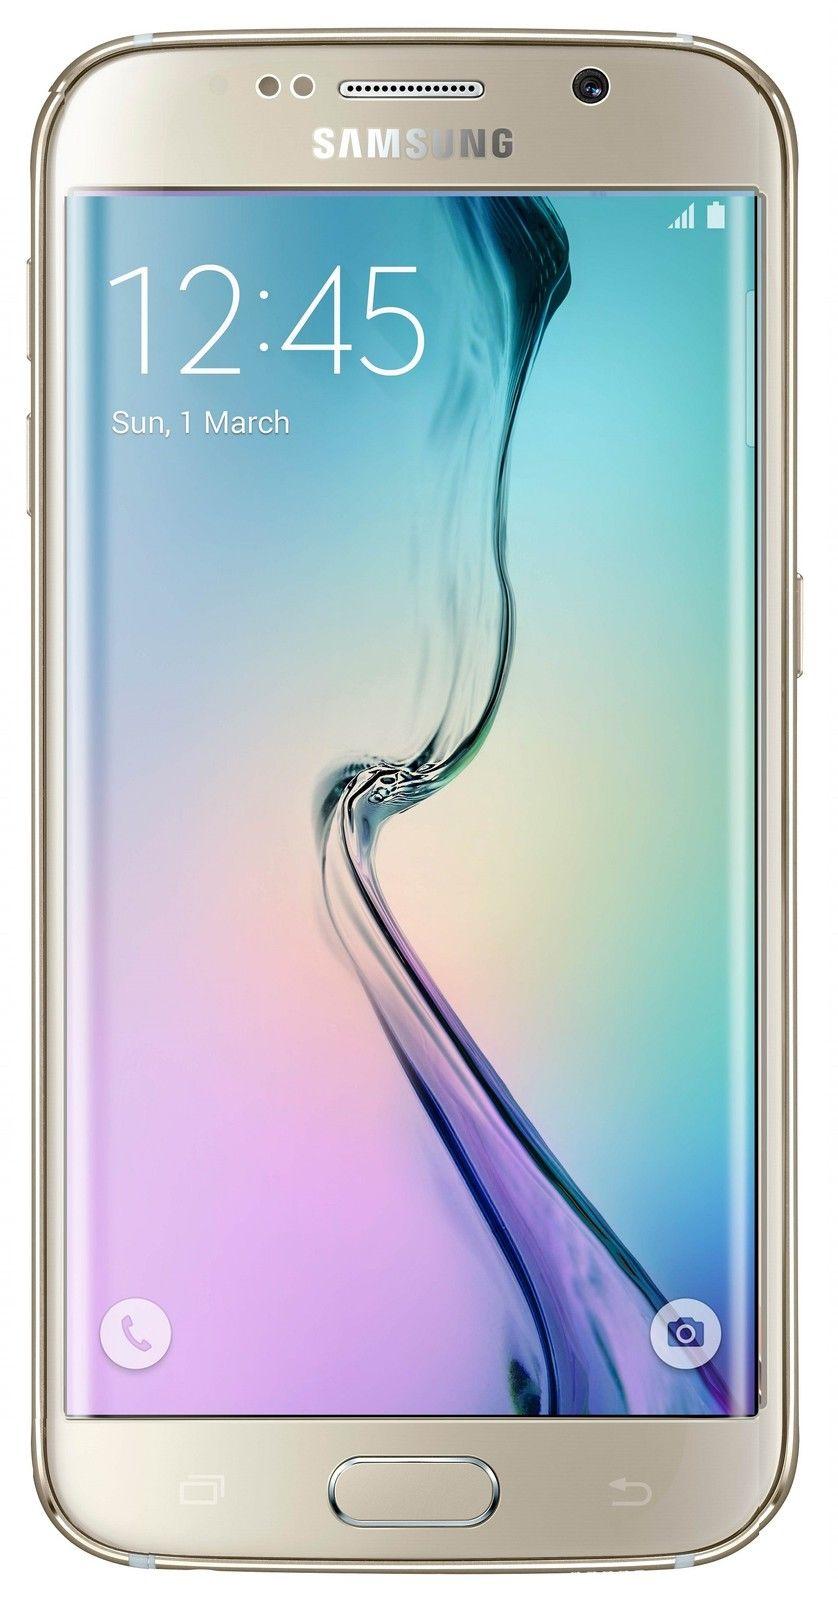 New Samsung Galaxy S6 Edge G925v 128GB Unlocked GSM + Verizon 4G LTE Smartphone $549.99 fs @ ebay